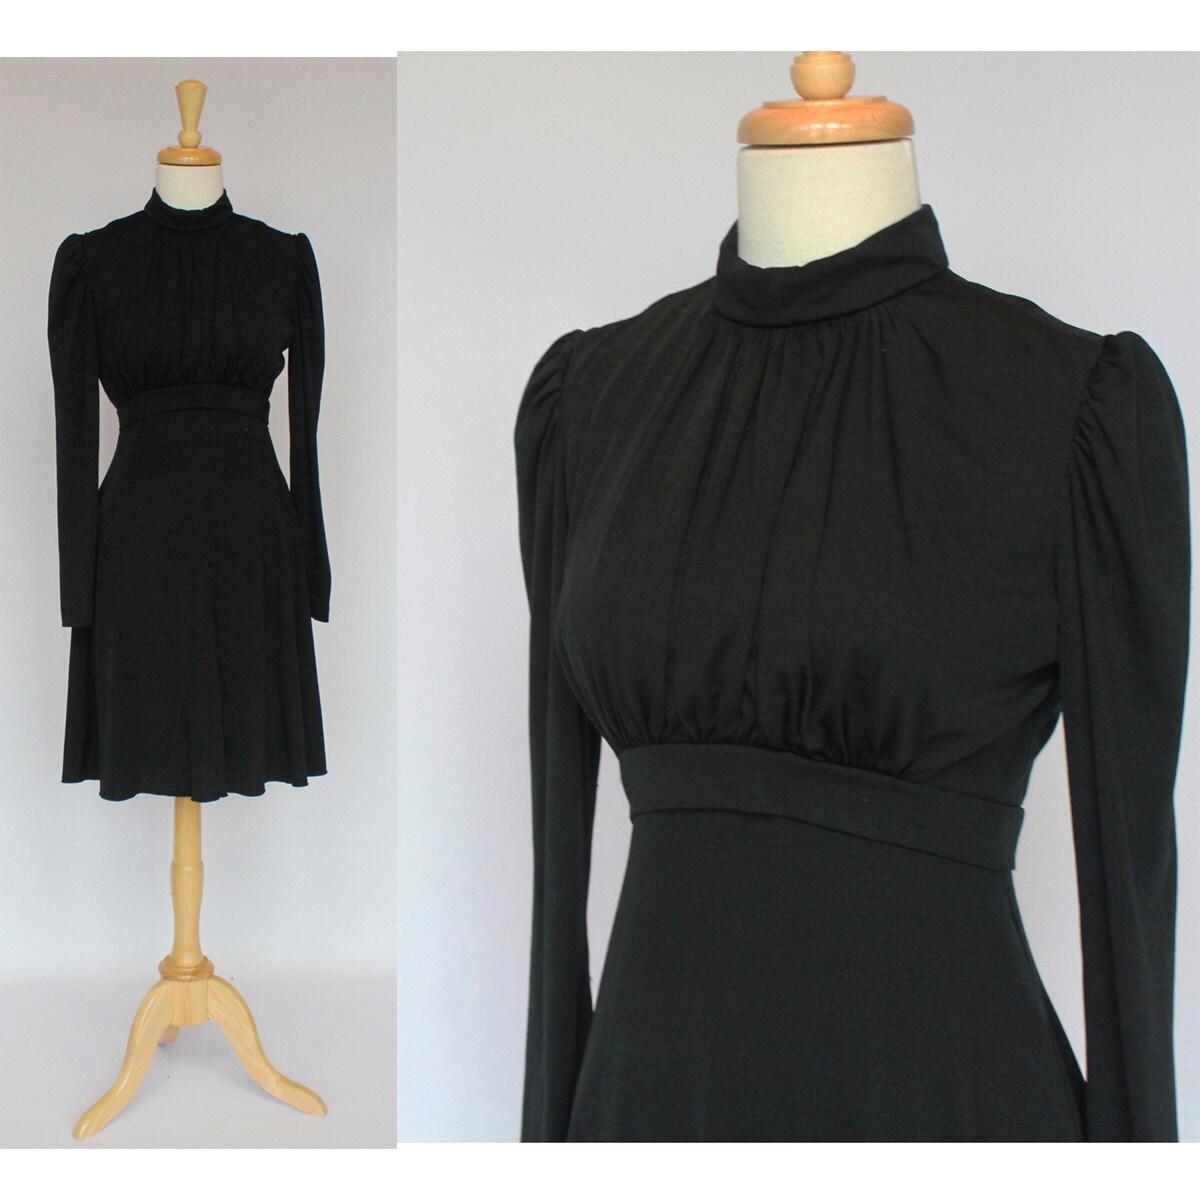 60's/70's  Black Knit Empire Waist Baby Doll Mini Dress - XSmall to Small